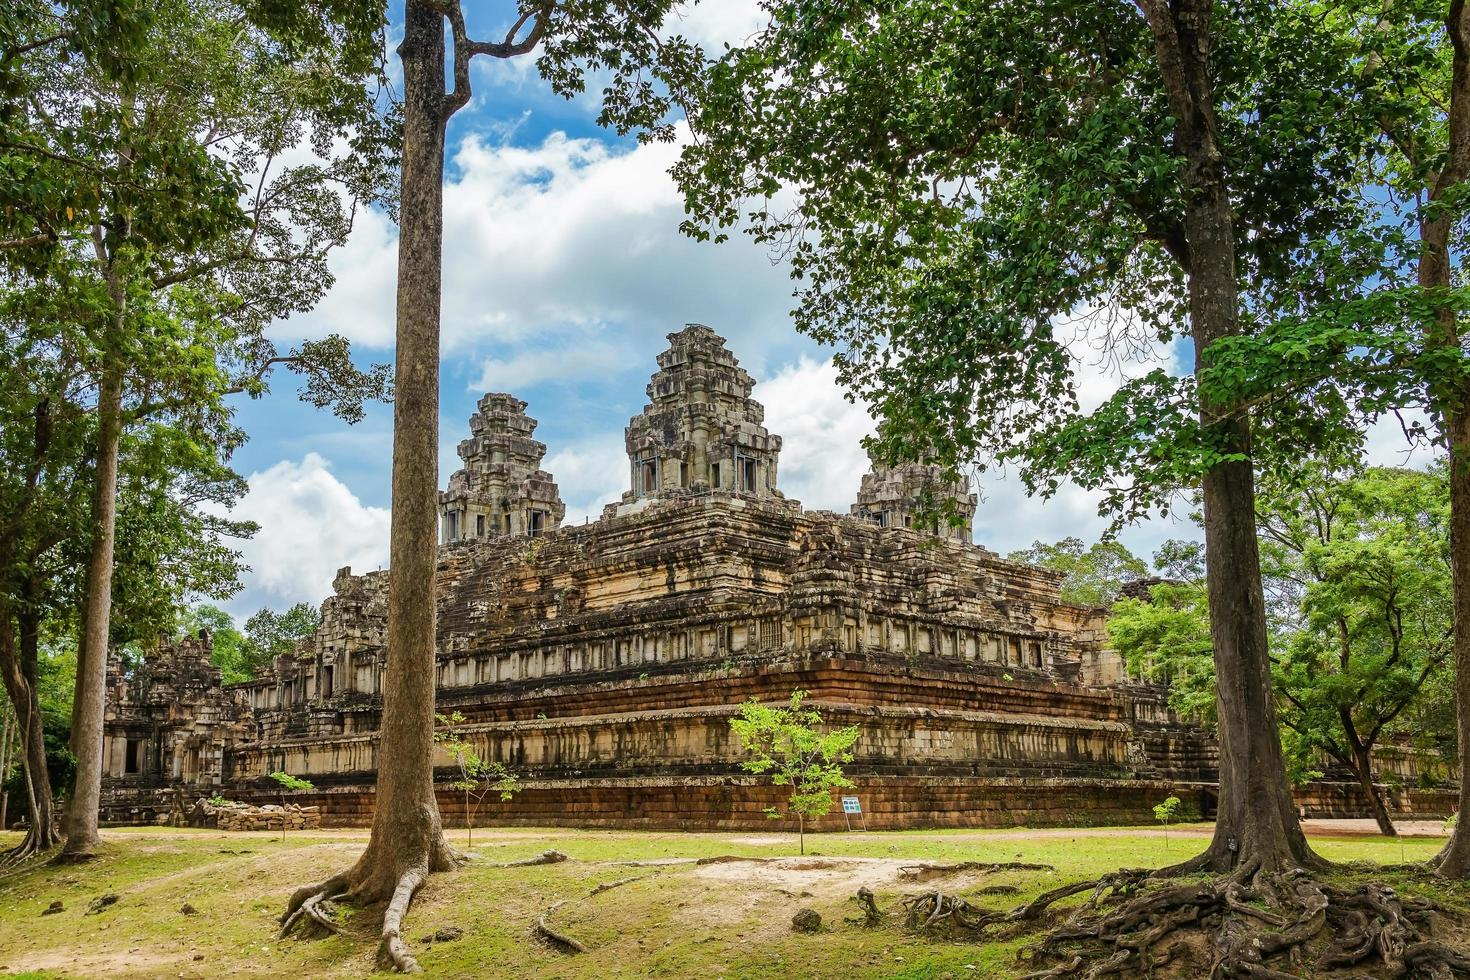 est mebon prasat tempio di angkor wat a siem reap, cambogia foto